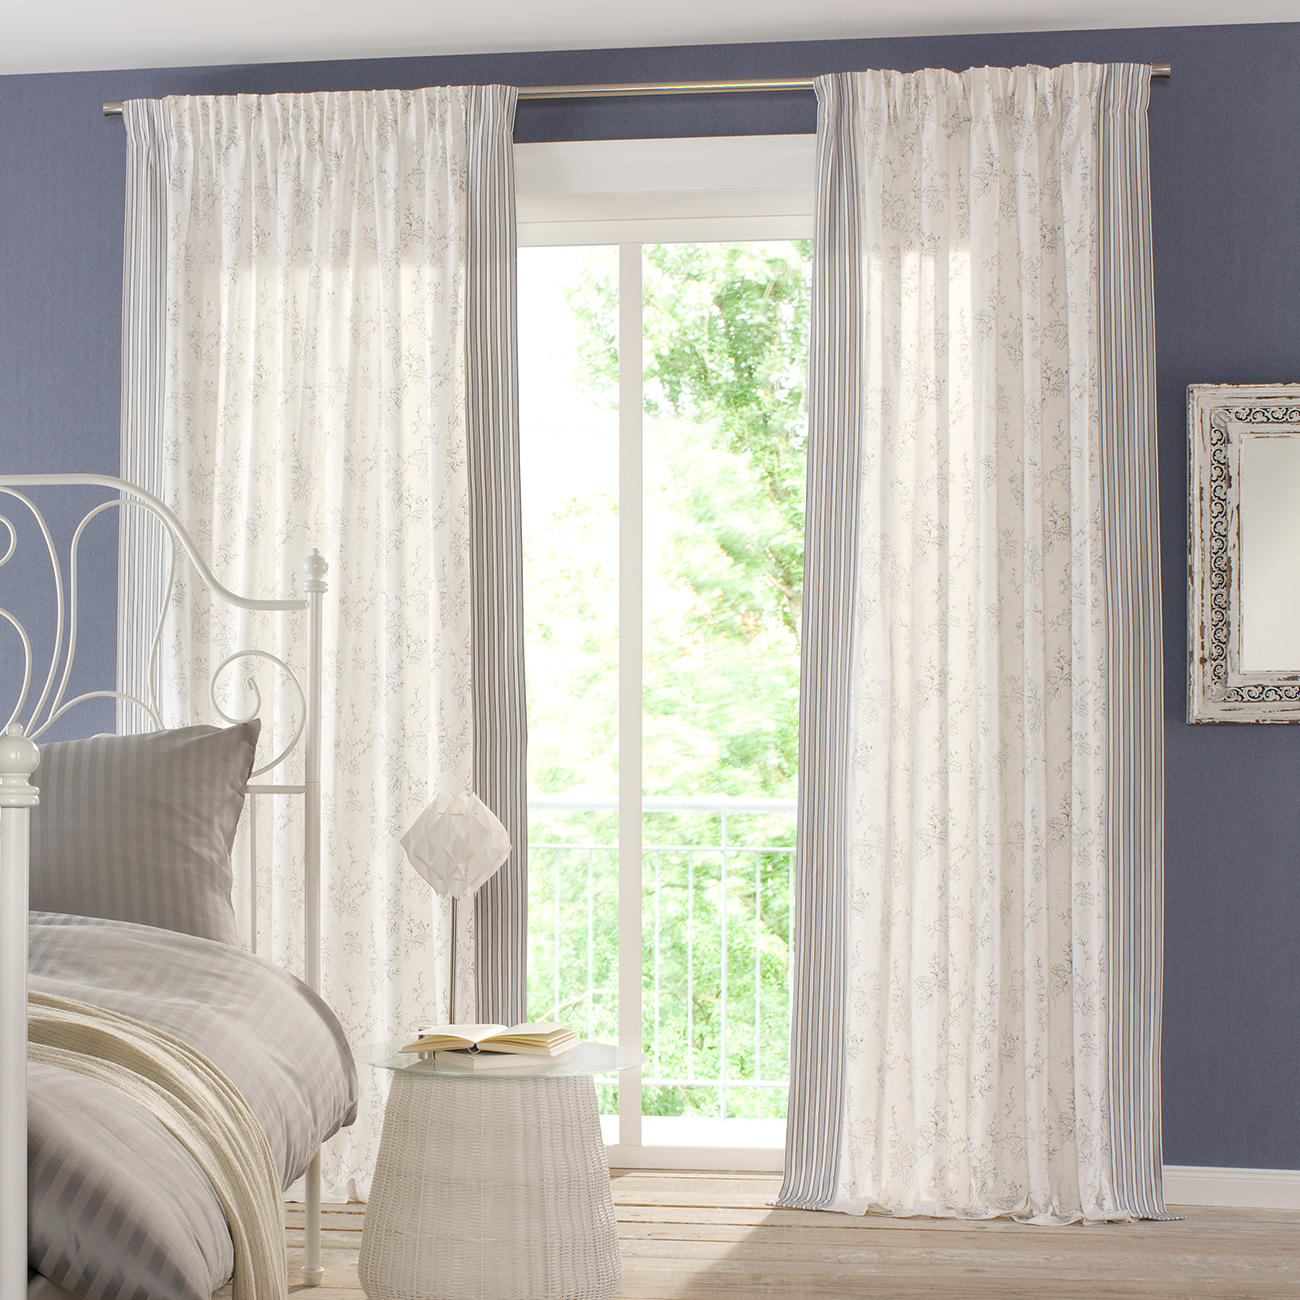 vorhang clover 1 vorhang mit 3 jahren garantie. Black Bedroom Furniture Sets. Home Design Ideas